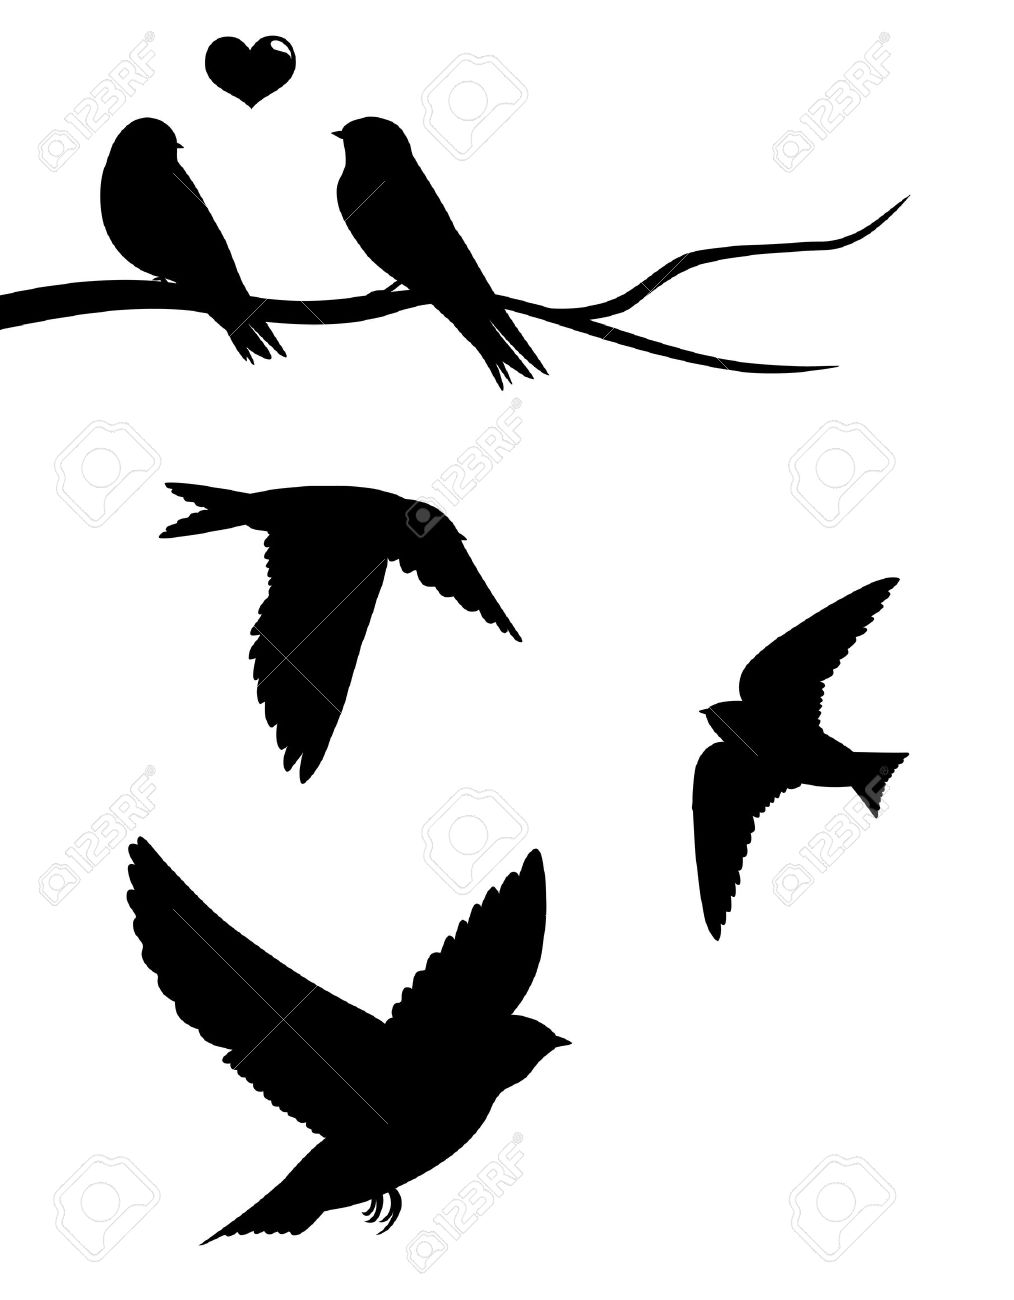 1014x1300 Swallow Bird Vector